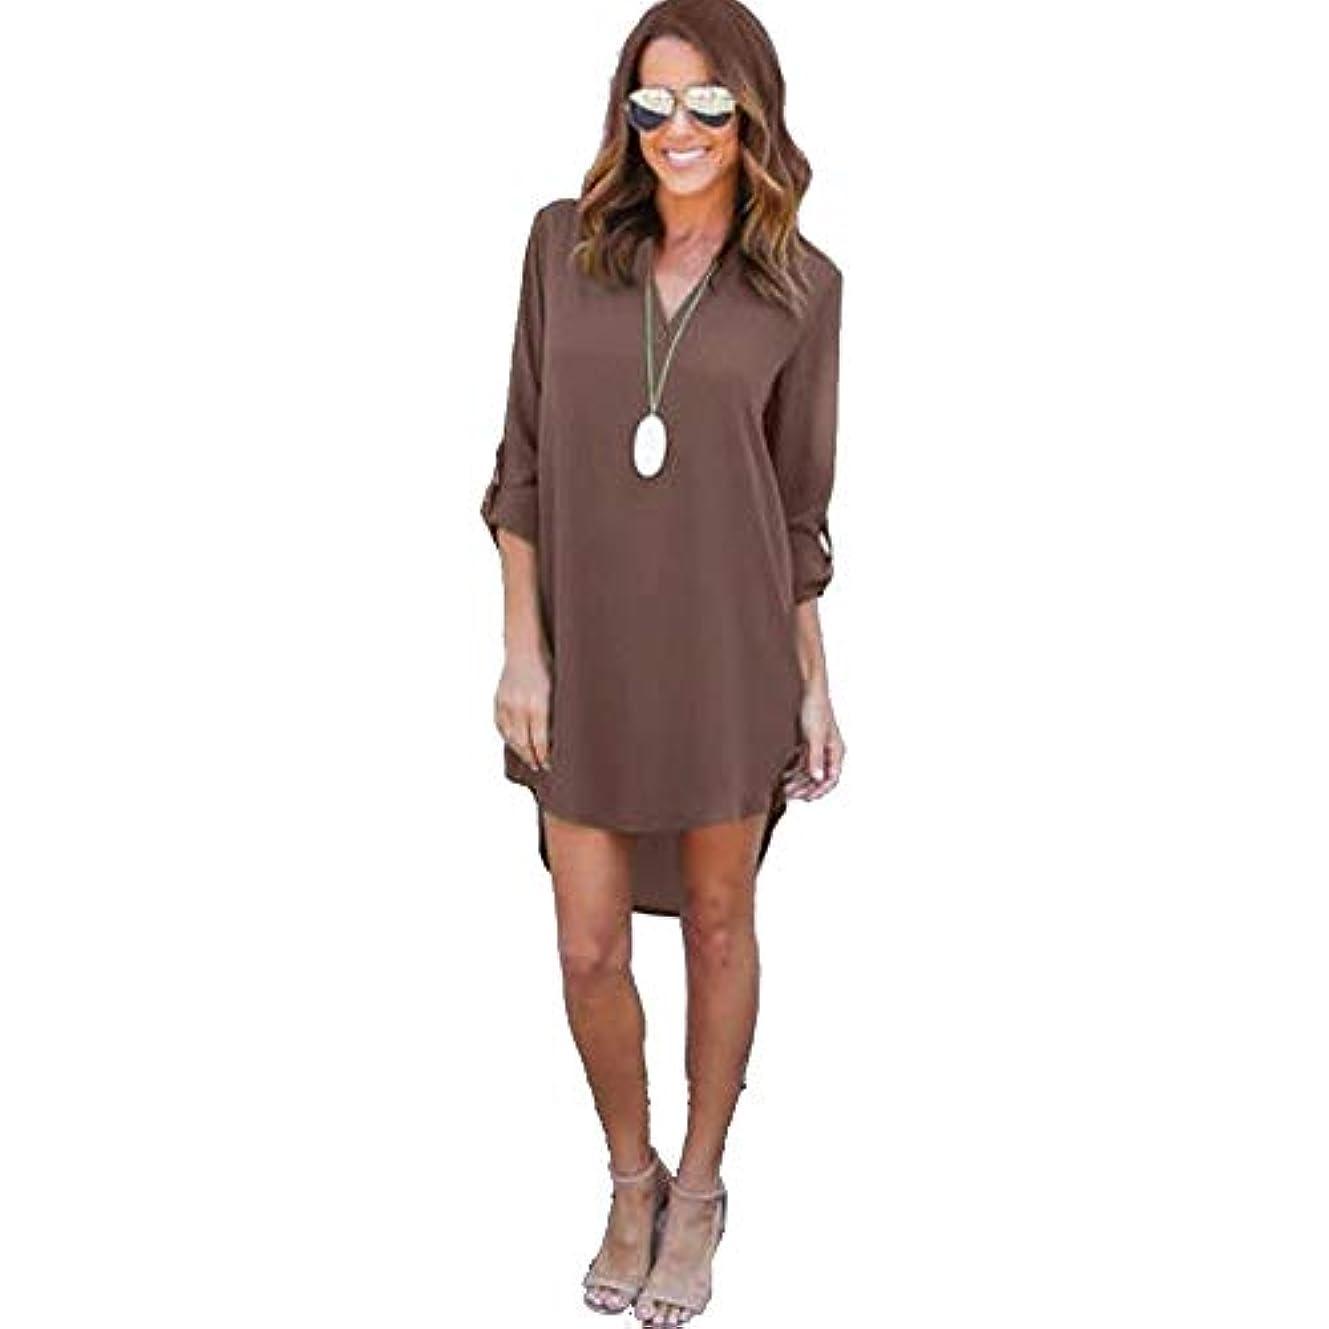 MIFAN女性ドレス、シフォン、Vネック、無地、長袖、ゆったり、ミニドレス、Tシャツドレス